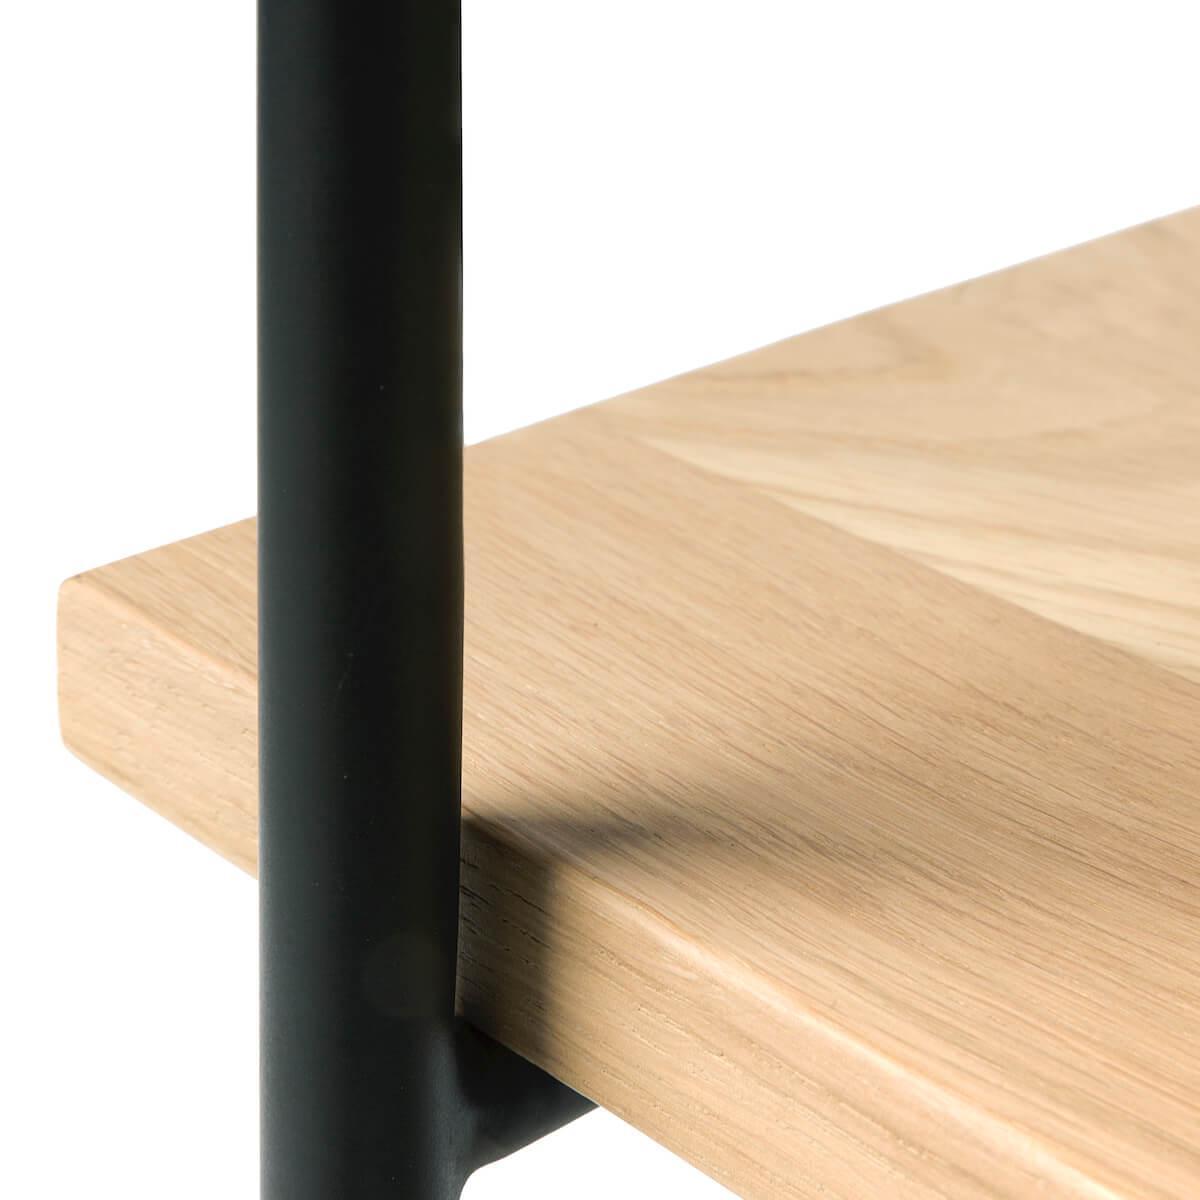 Table basse 100x100cm RISE Ethnicraft chêne